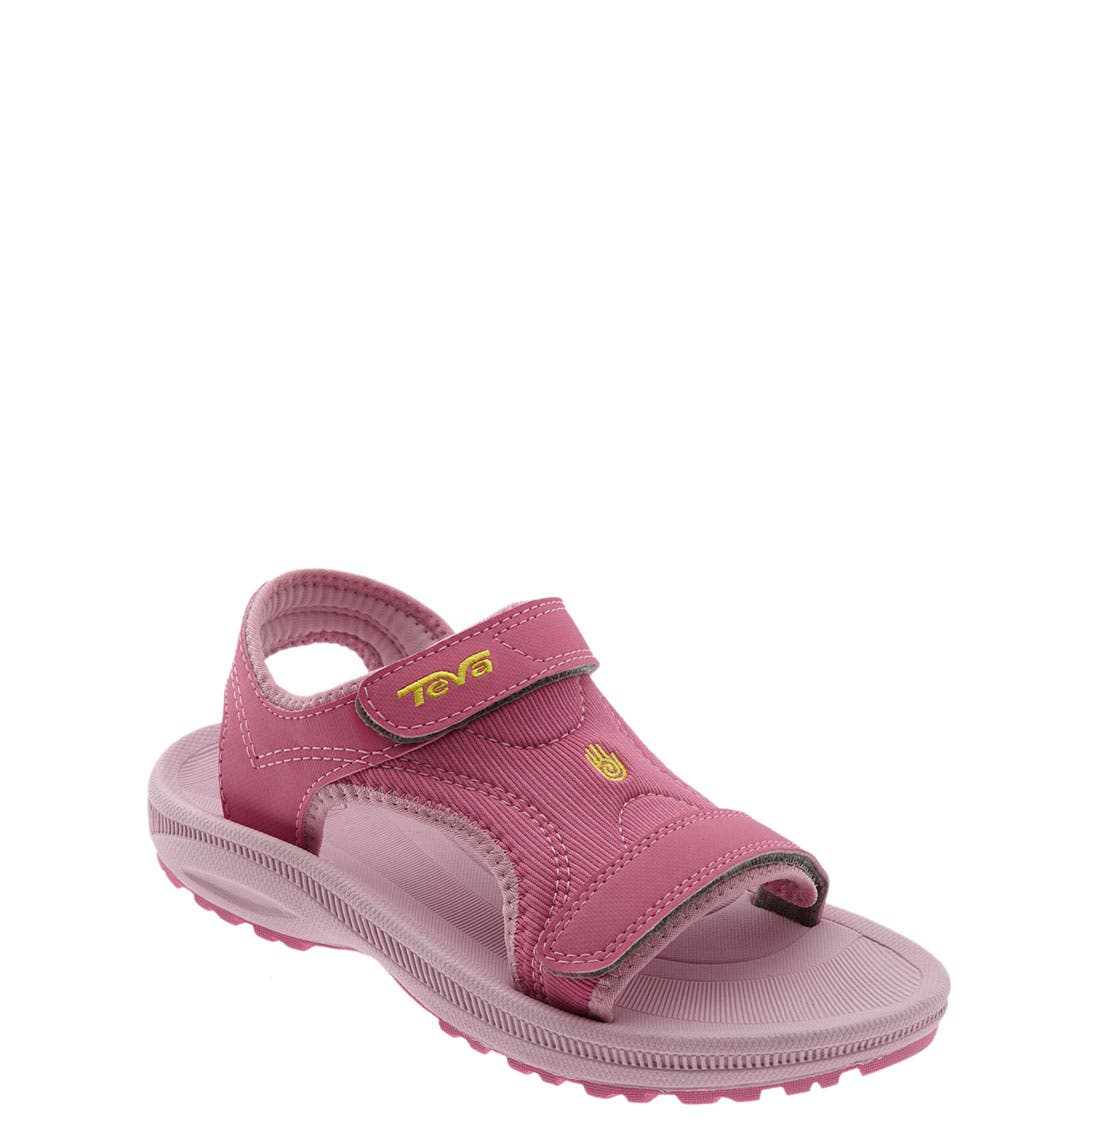 Main Image - Teva 'Psyclone' Water Sandal (Toddler, Little Kid & Big Kid)